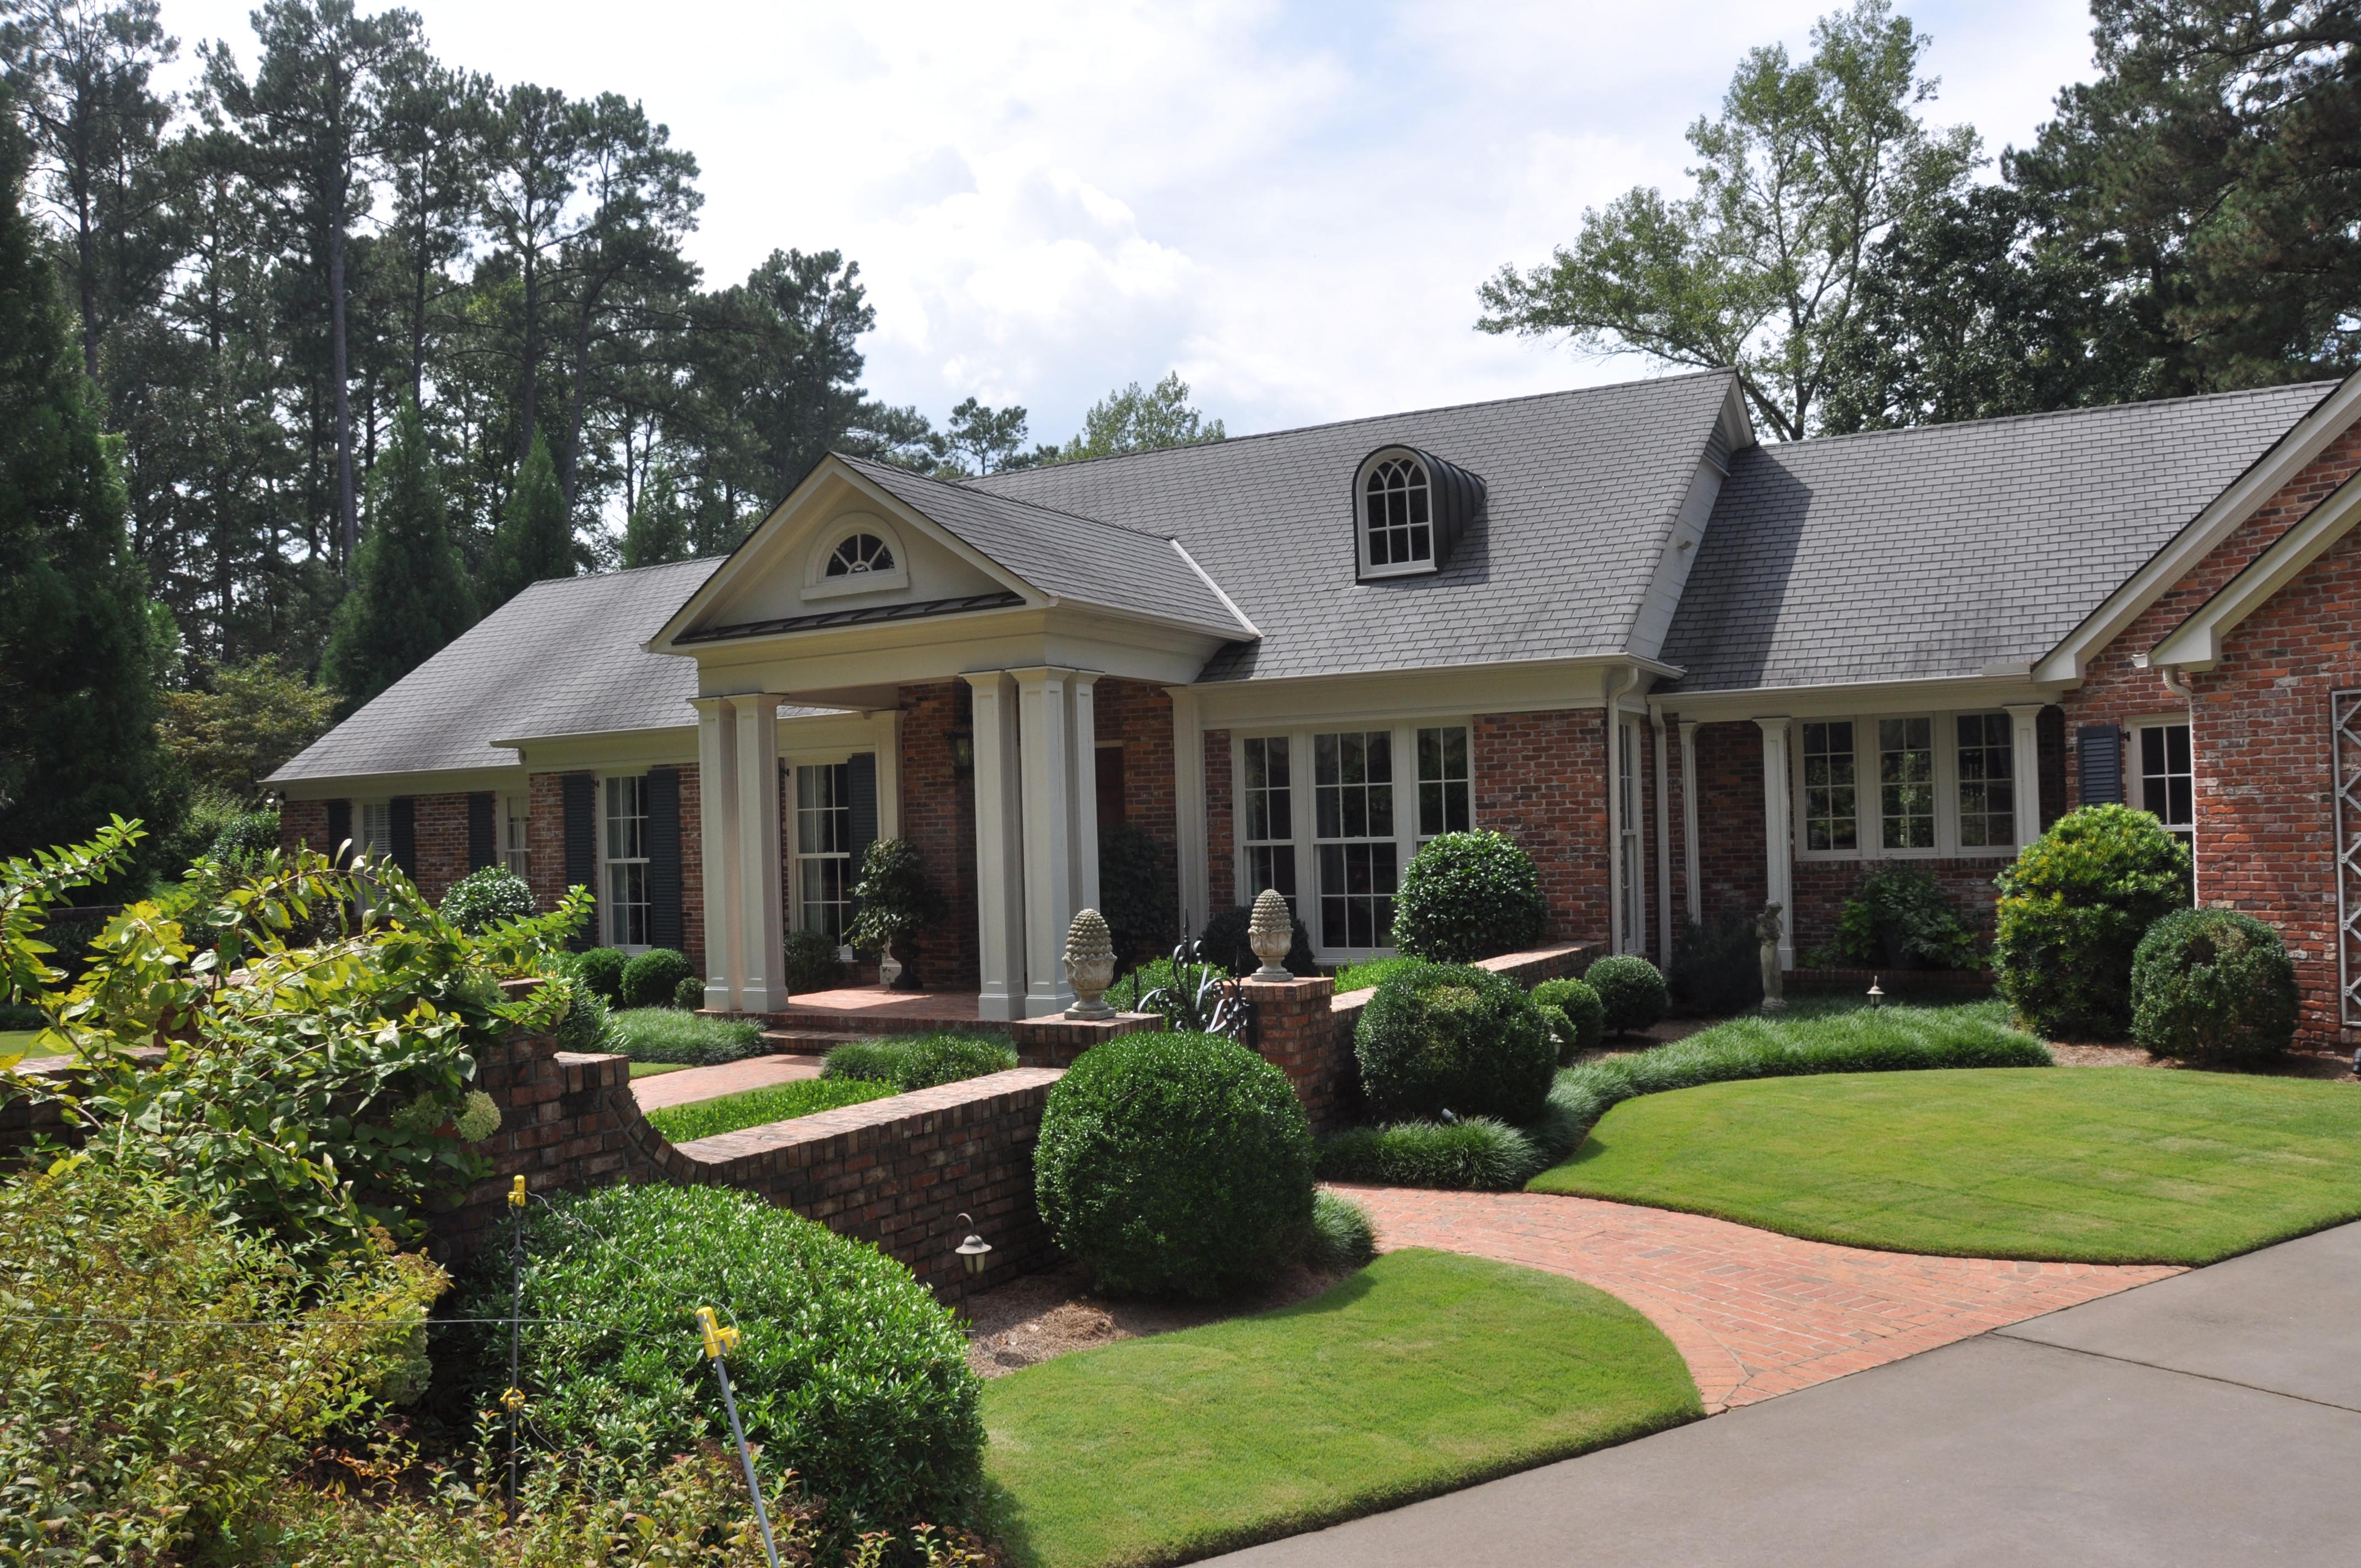 1104 Country Club Dr, Lagrange, Georgia 30240